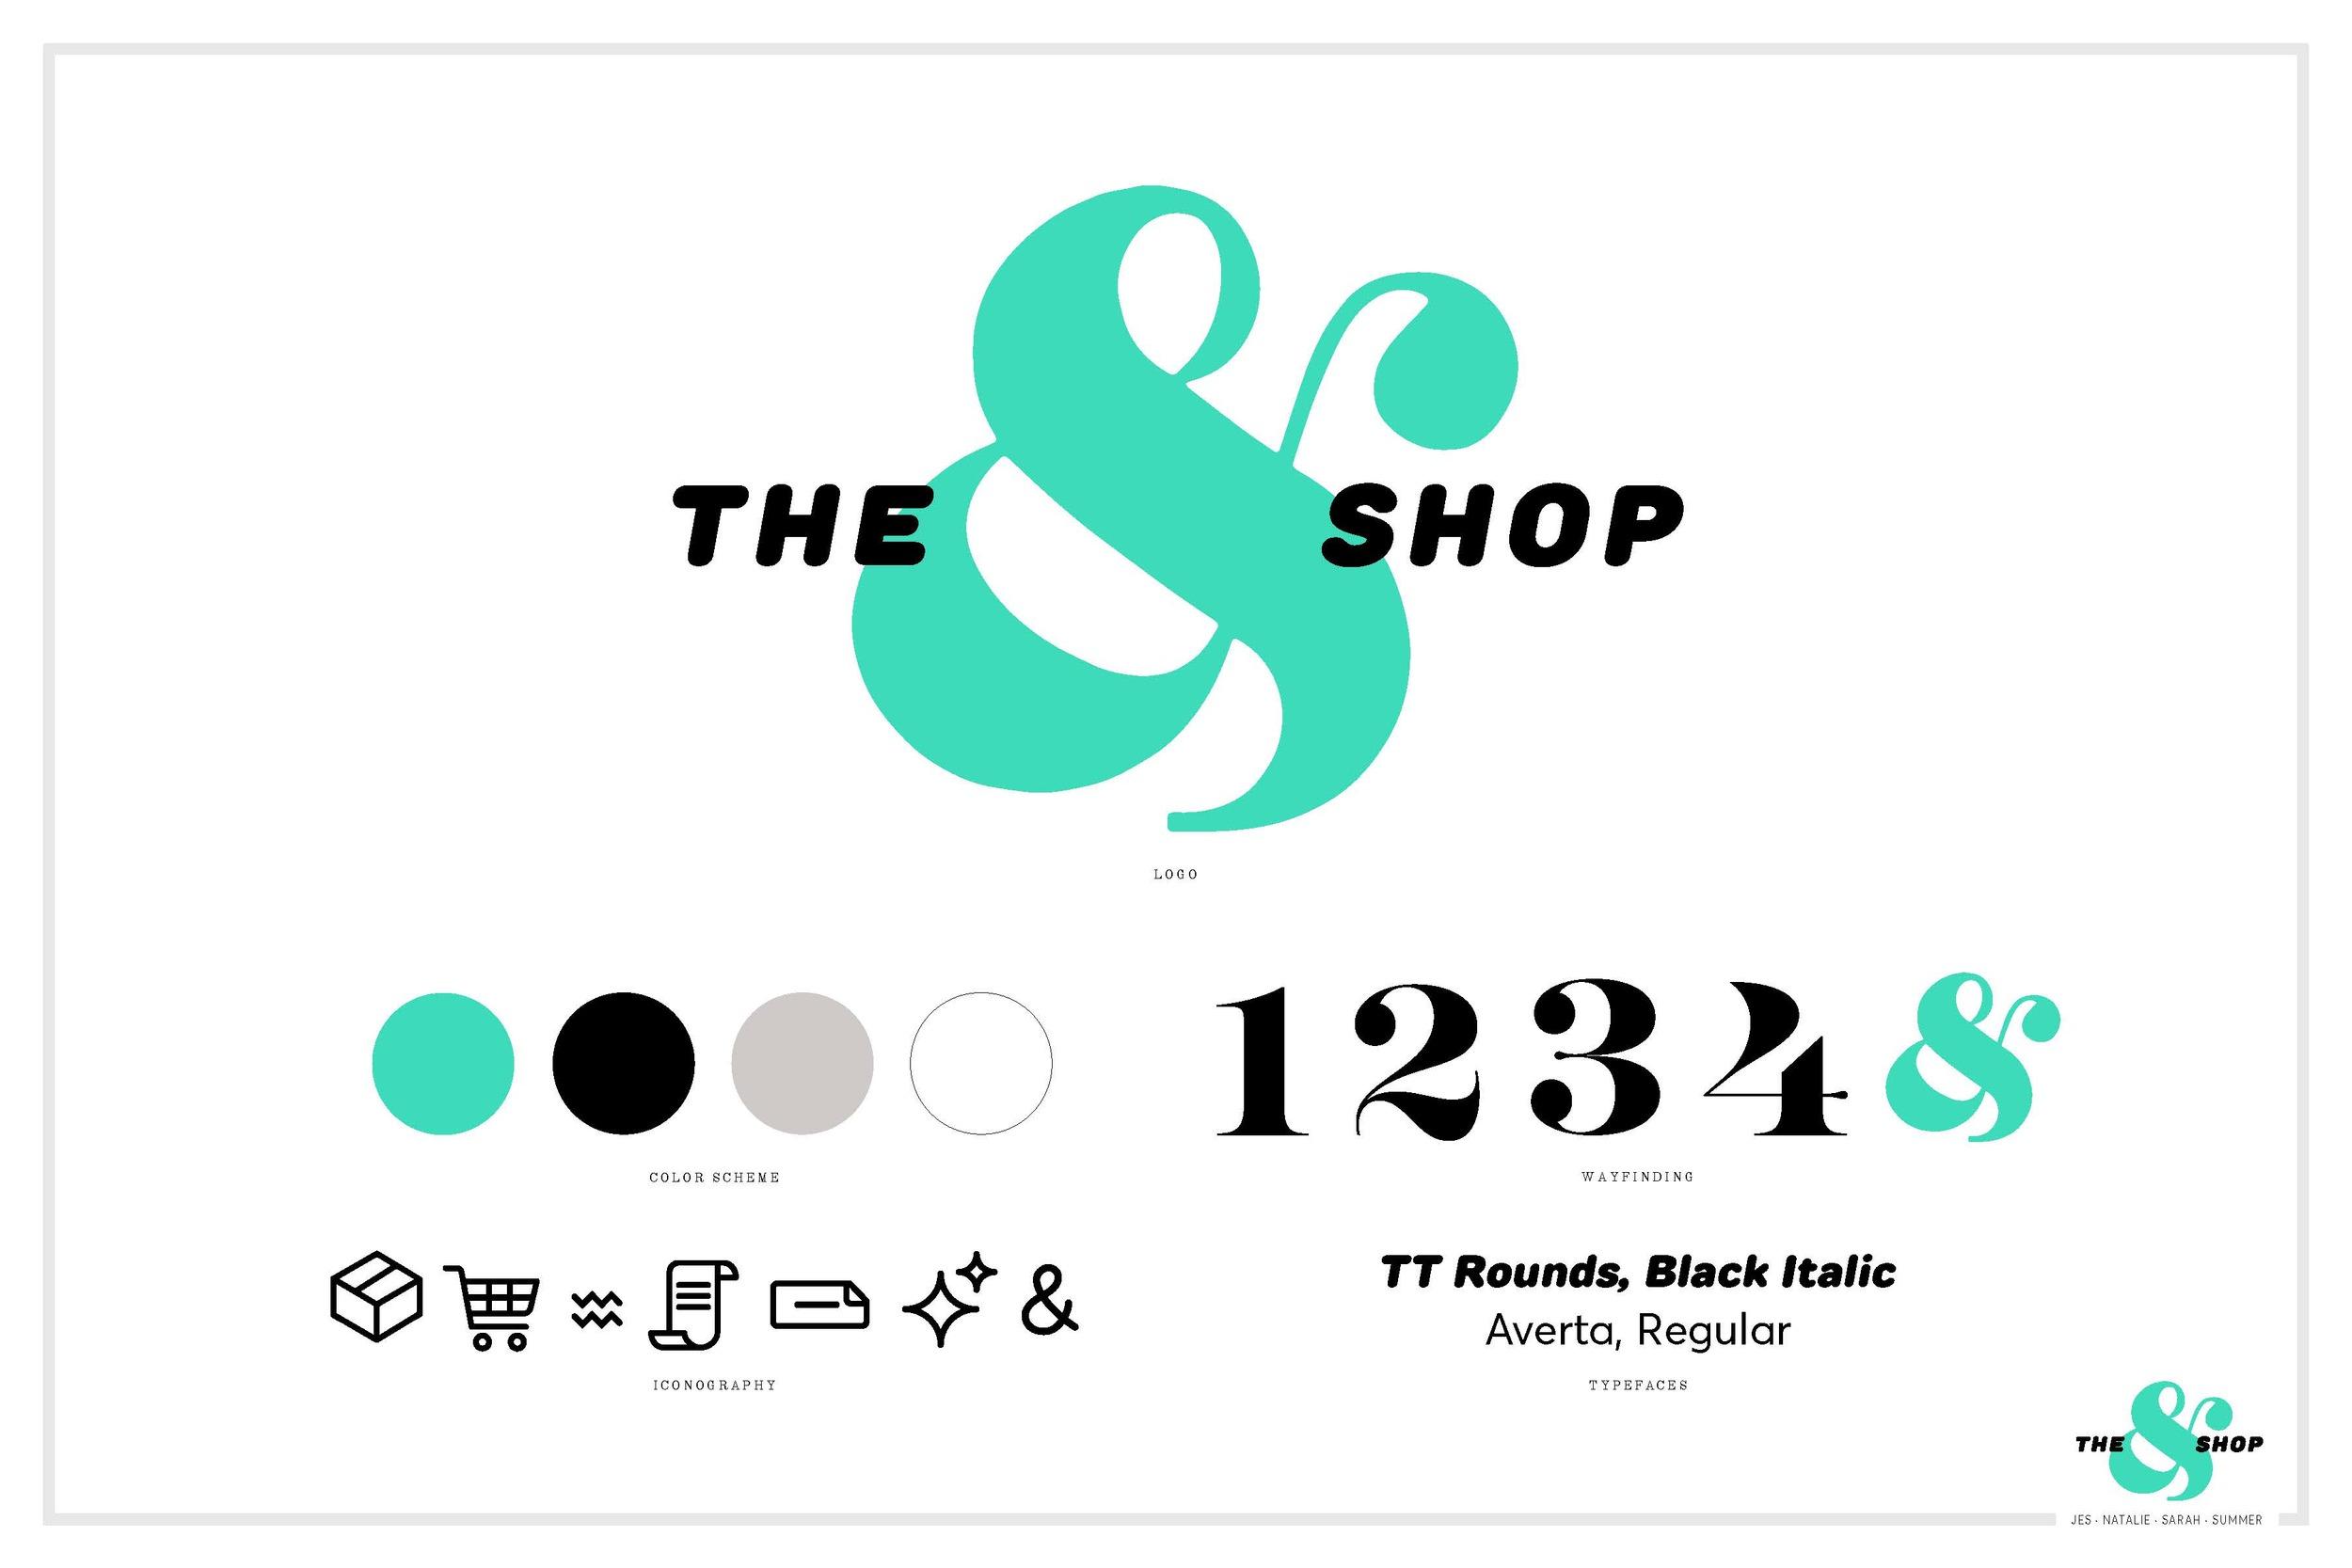 &-Shop-Digital-Presentation_Page_14.jpg